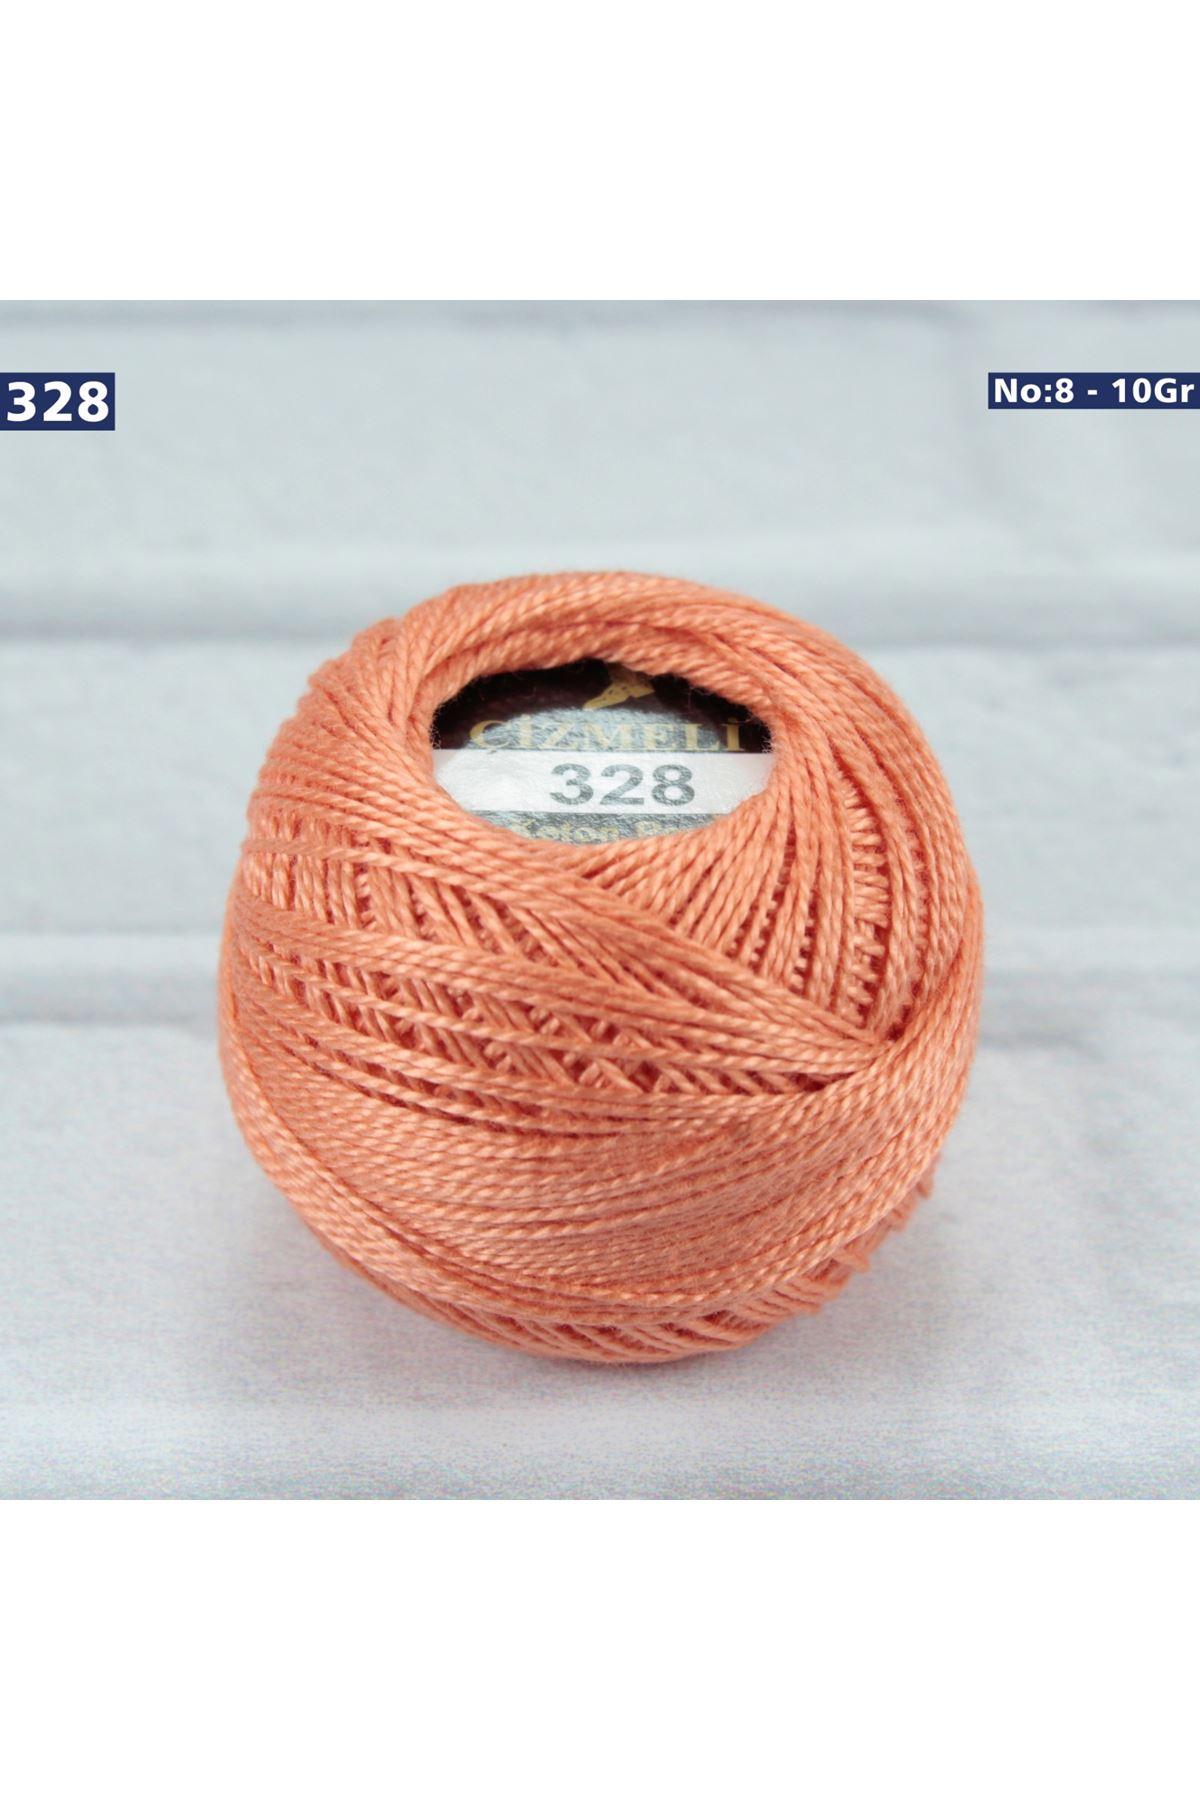 Çizmeli Cotton Perle Nakış İpliği No: 328